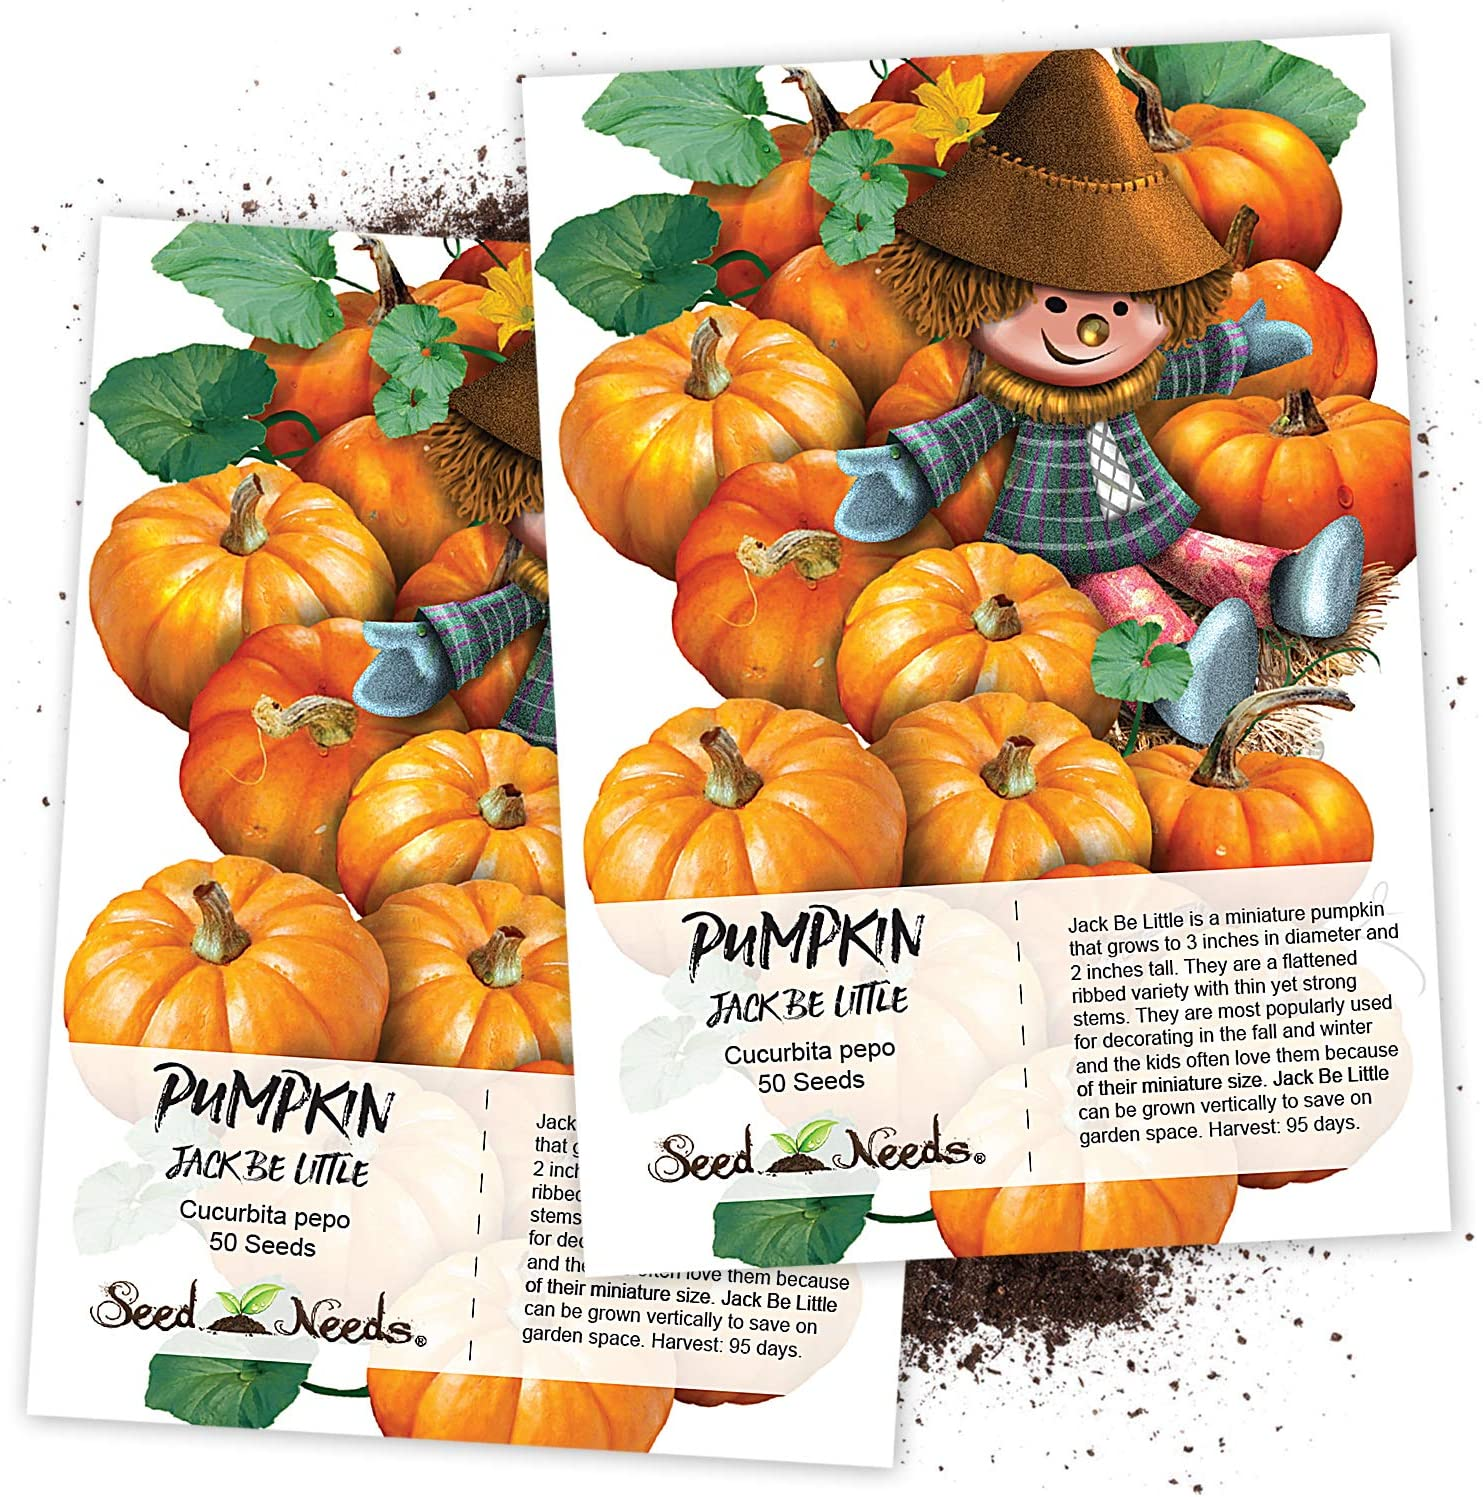 Seed Needs, Jack Be Little Pumpkin (Cucurbita Pepo) Twin Pack of 50 Seeds Each Non-GMO